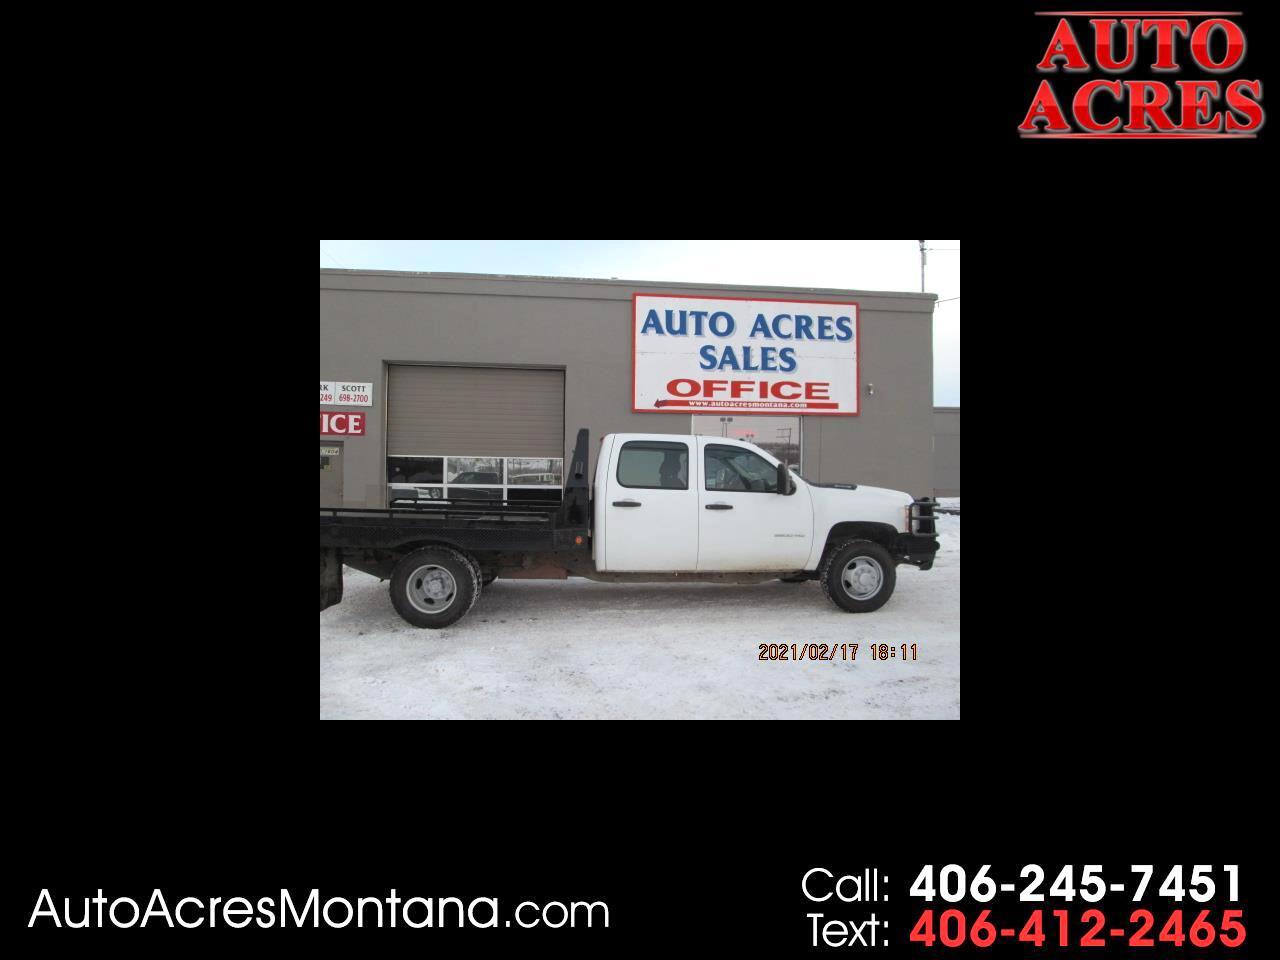 "Chevrolet Silverado 3500HD 4WD Crew Cab 171.5"" WB, 59.4"" CA WT 2012"